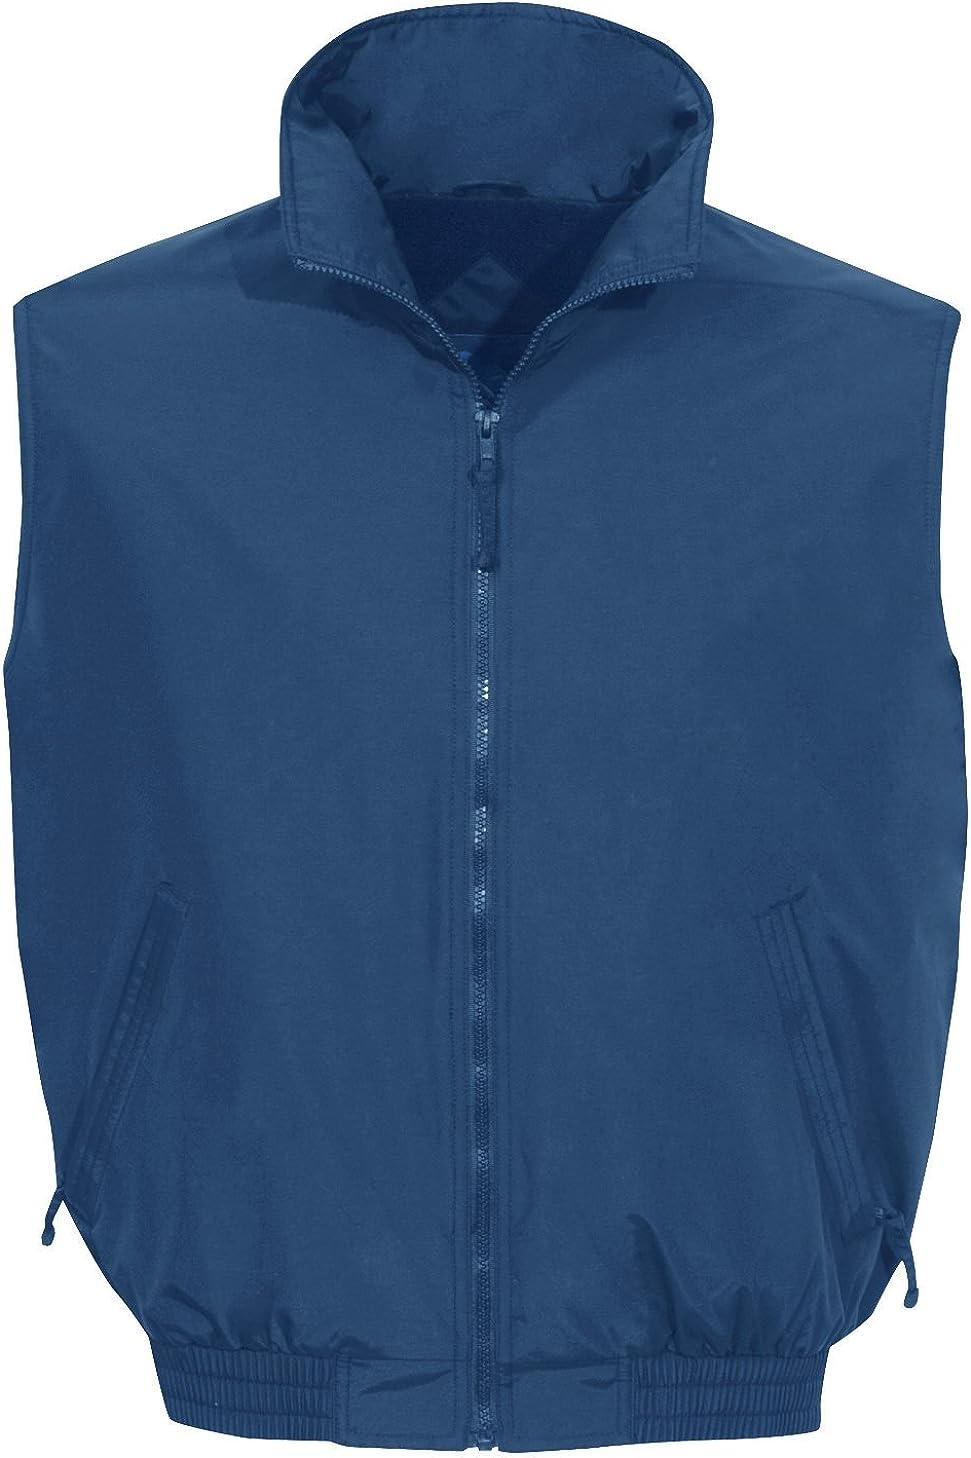 Tri-Mountain 8400 Ridge Rider Windproof/Water Resistant Toughlan Nylon Vest